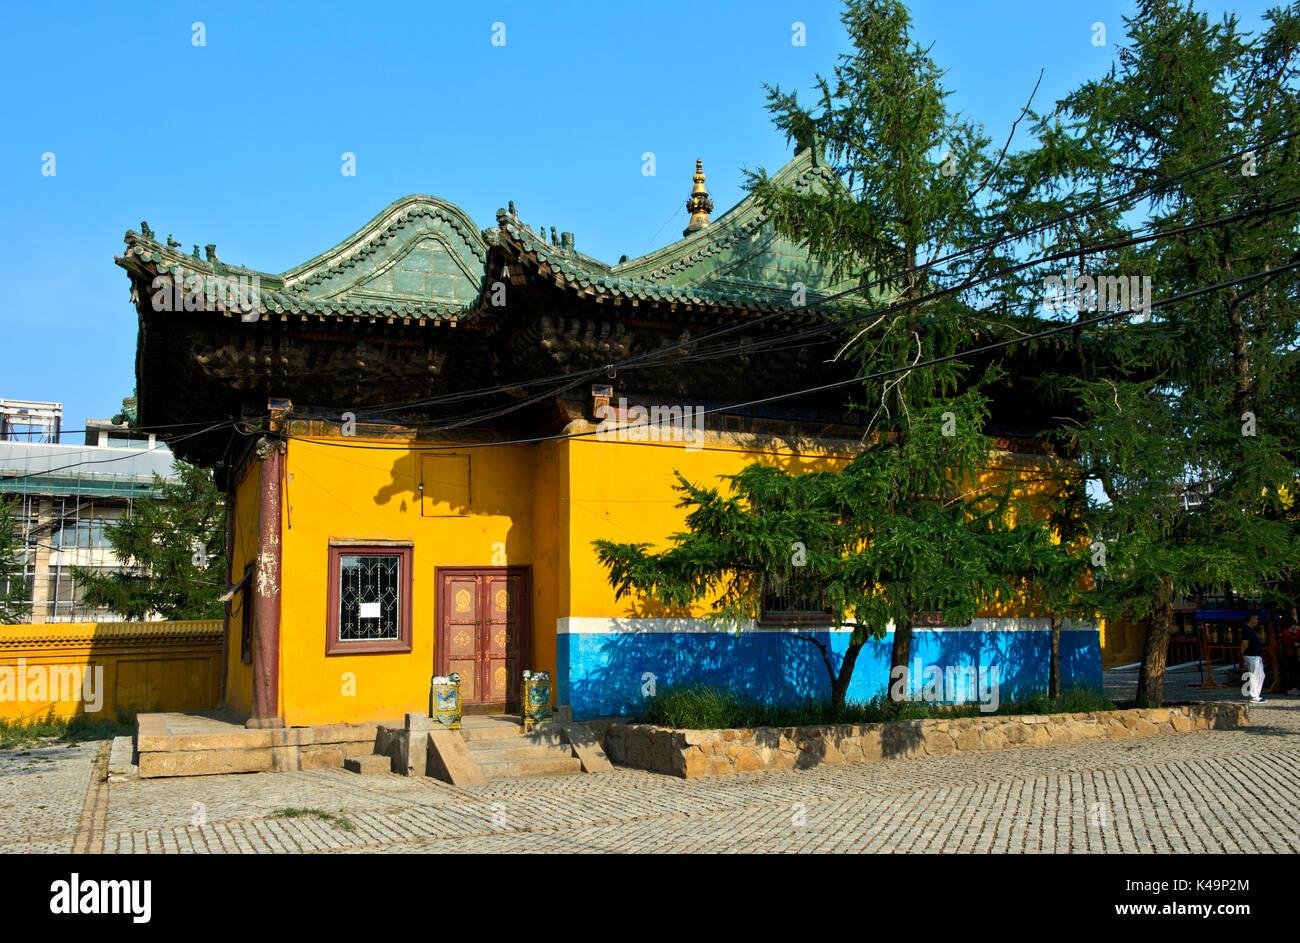 Library In The Gandan Complex, Gandantegchinlen Monastery, Ulaanbaatar, Mongolia - Stock Image